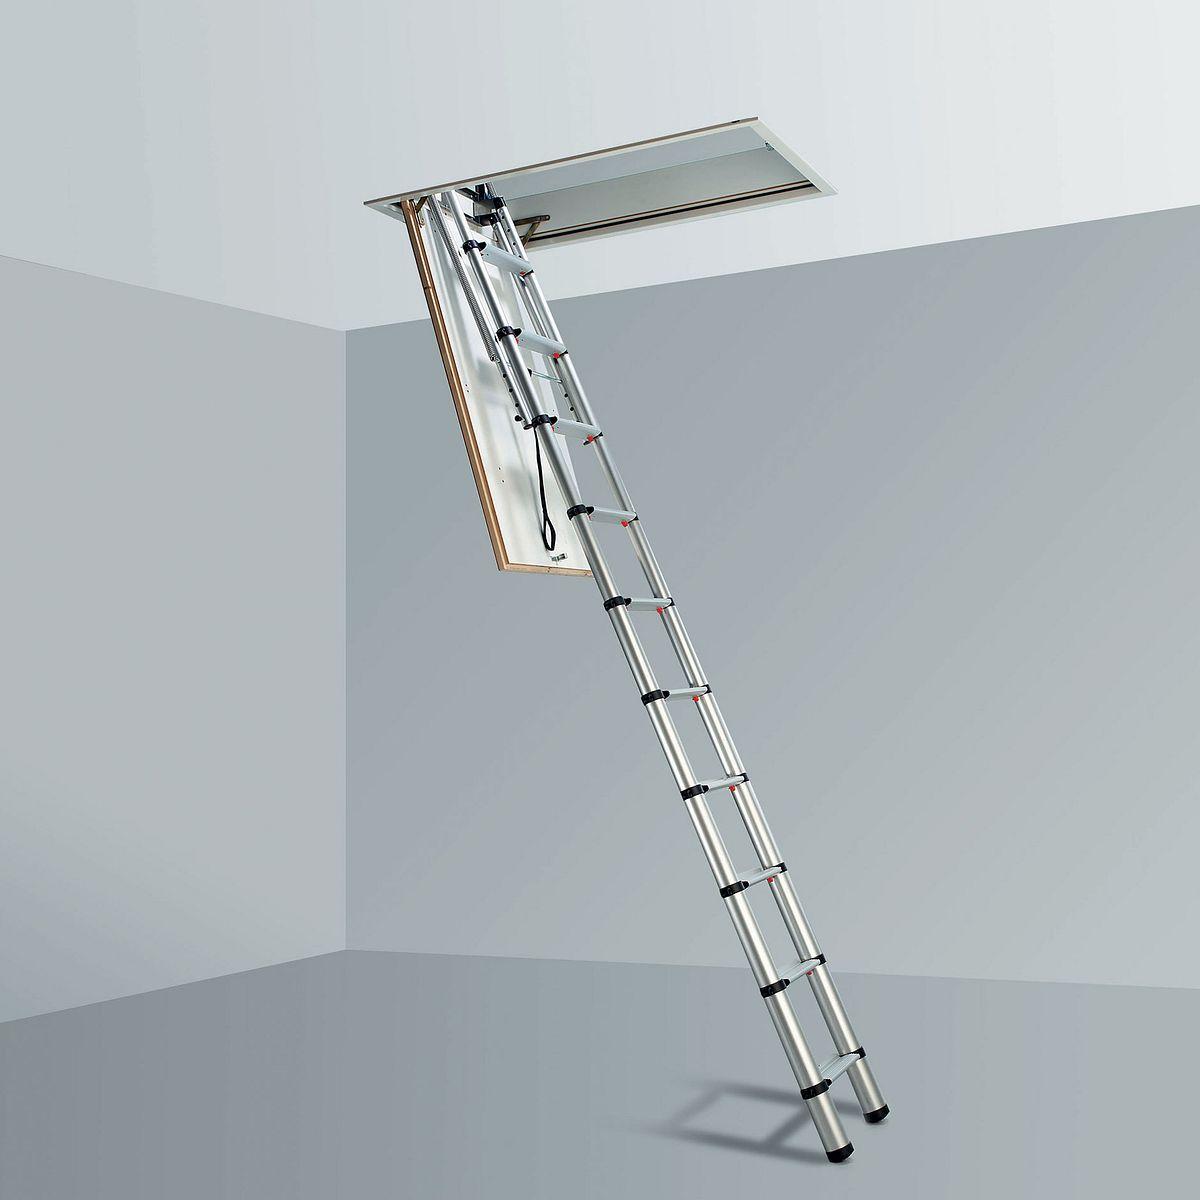 ... 87301 Loft Ladders - Werner EU & 87301 | Loft Ladders | Werner EU